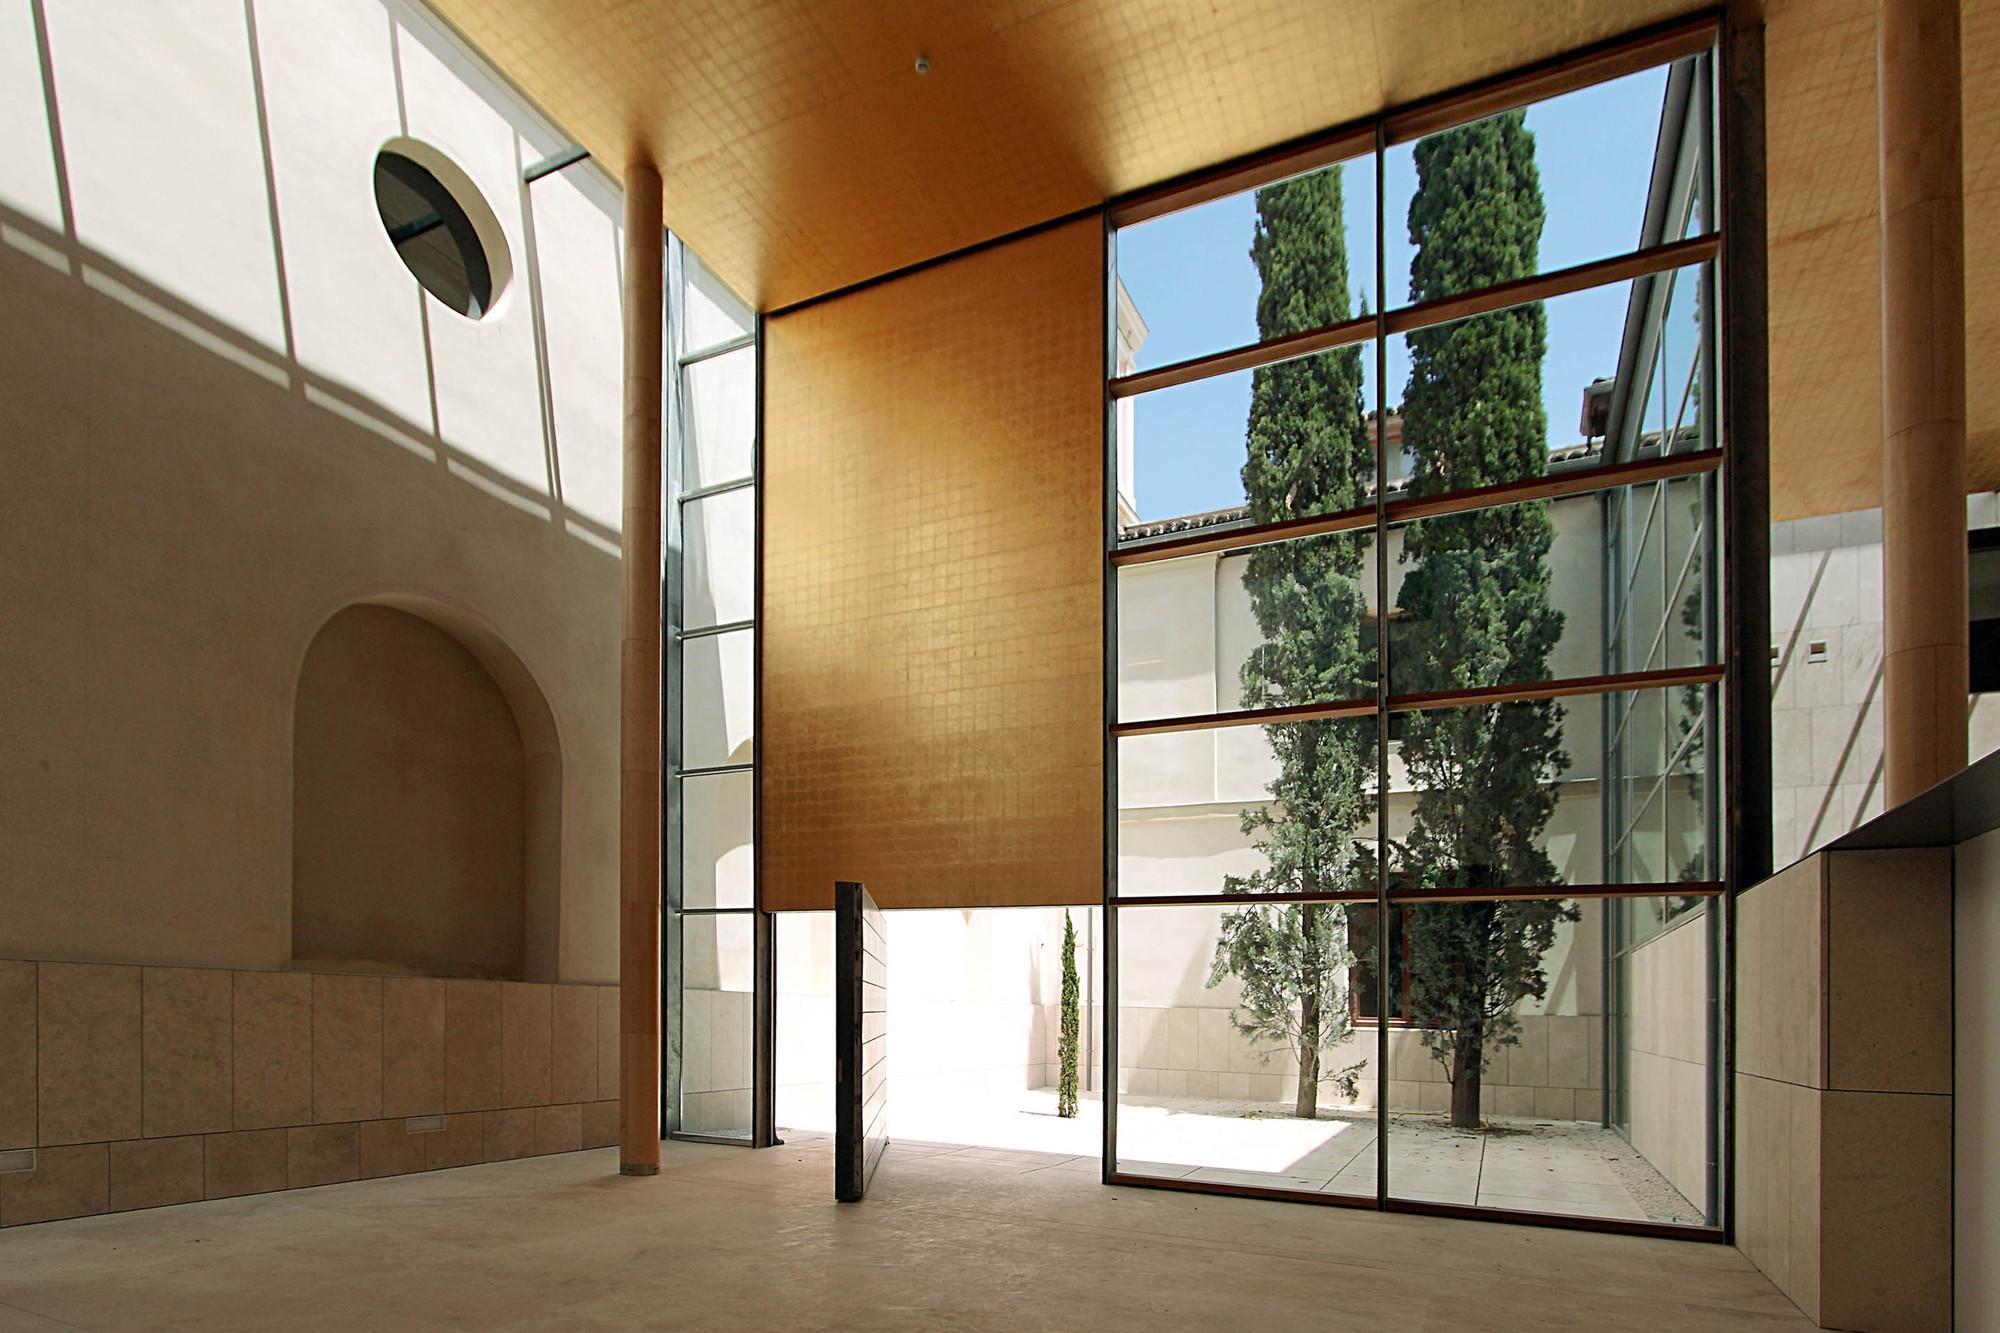 Rehabilitation of the Madrid History Museum / Frade Arquitectos, © Manuel Pérez Cazorla